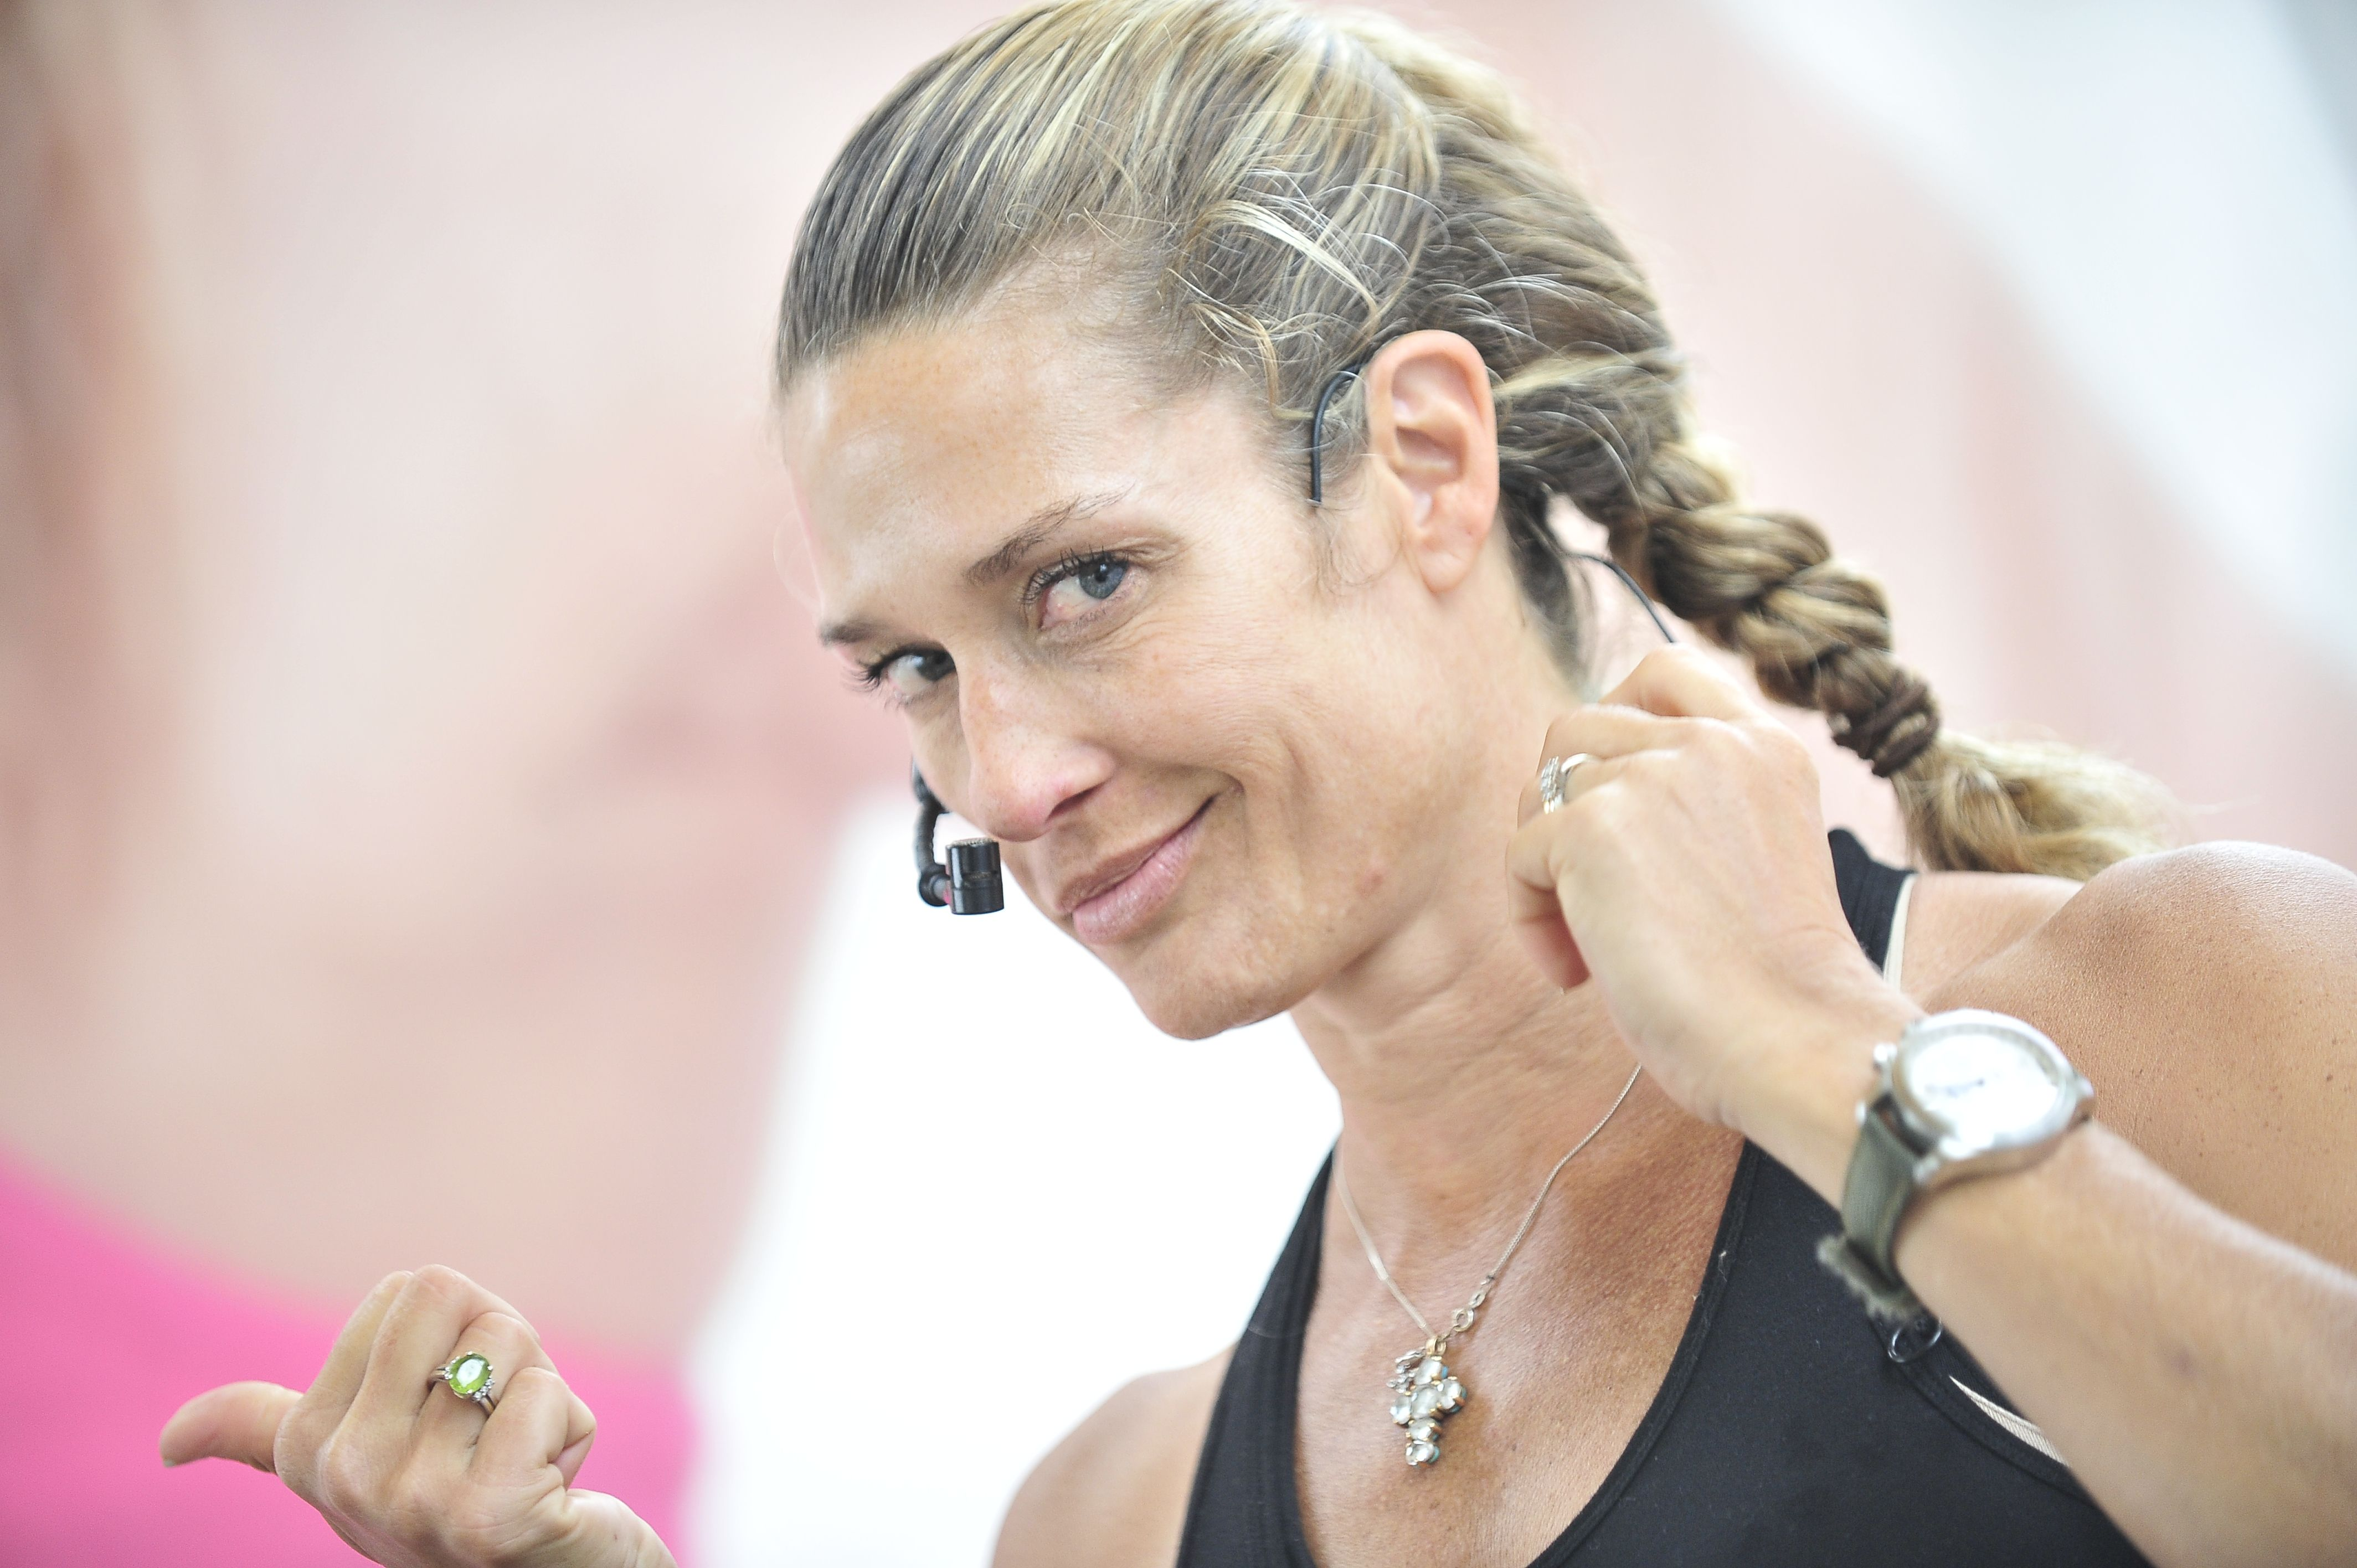 Sara Murphy Extreme Weight Loss